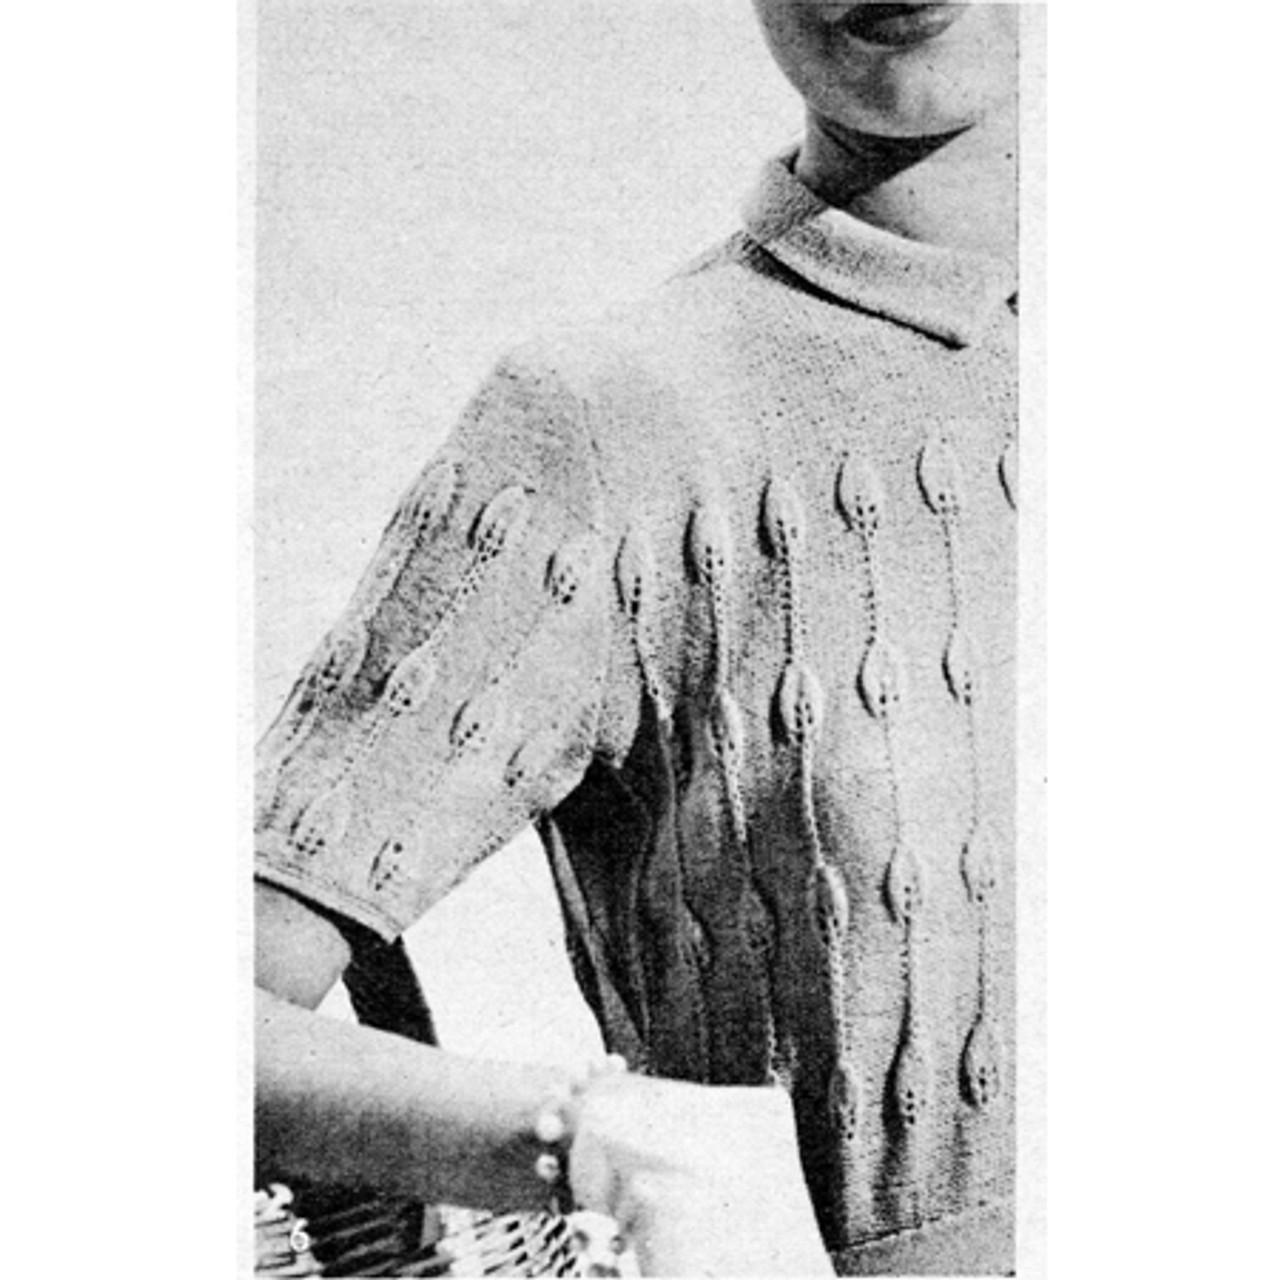 Vintage Knitted Shirtwaist Dress Pattern